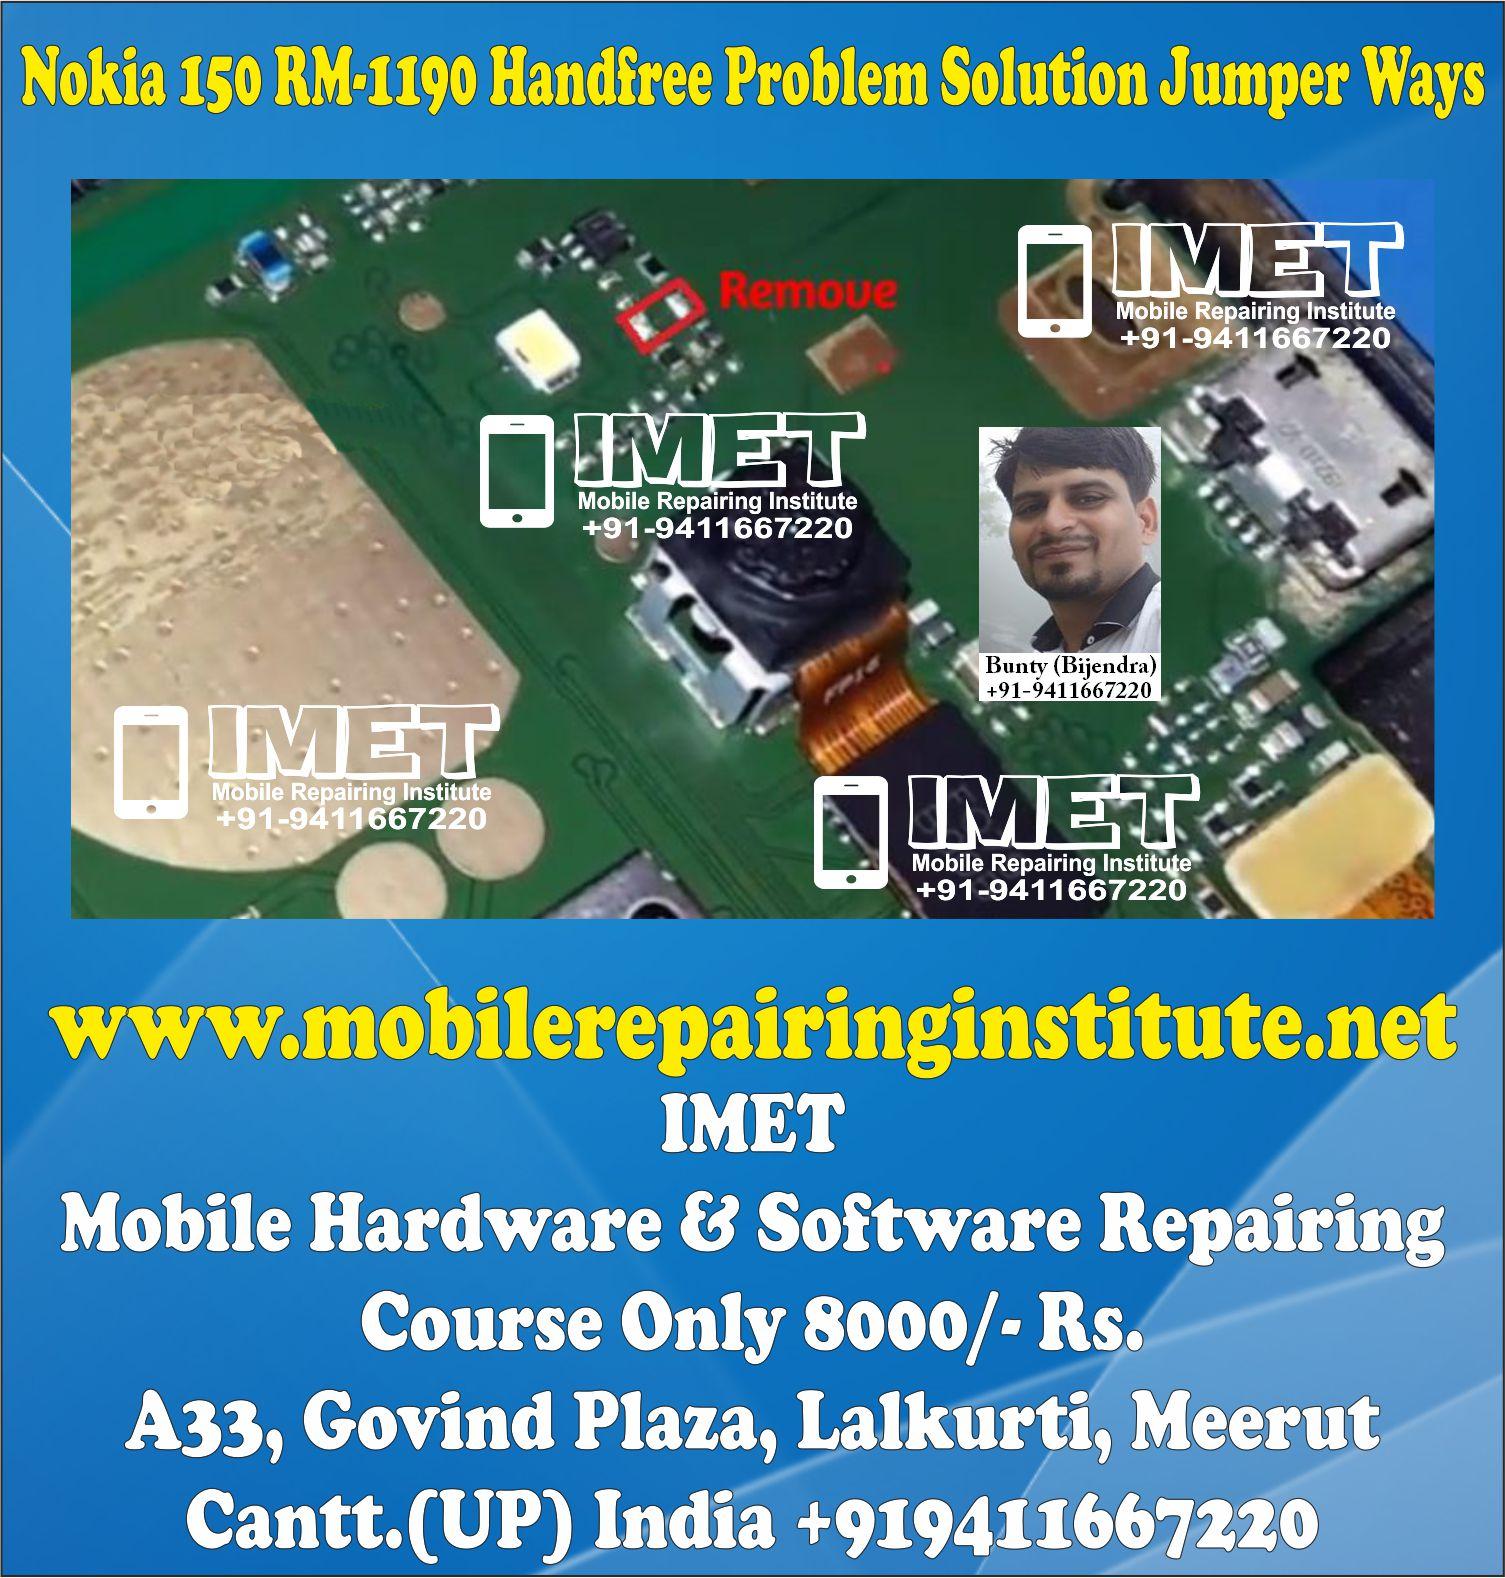 Nokia 150 RM-1190 Handfree Problem Solution Jumper Ways